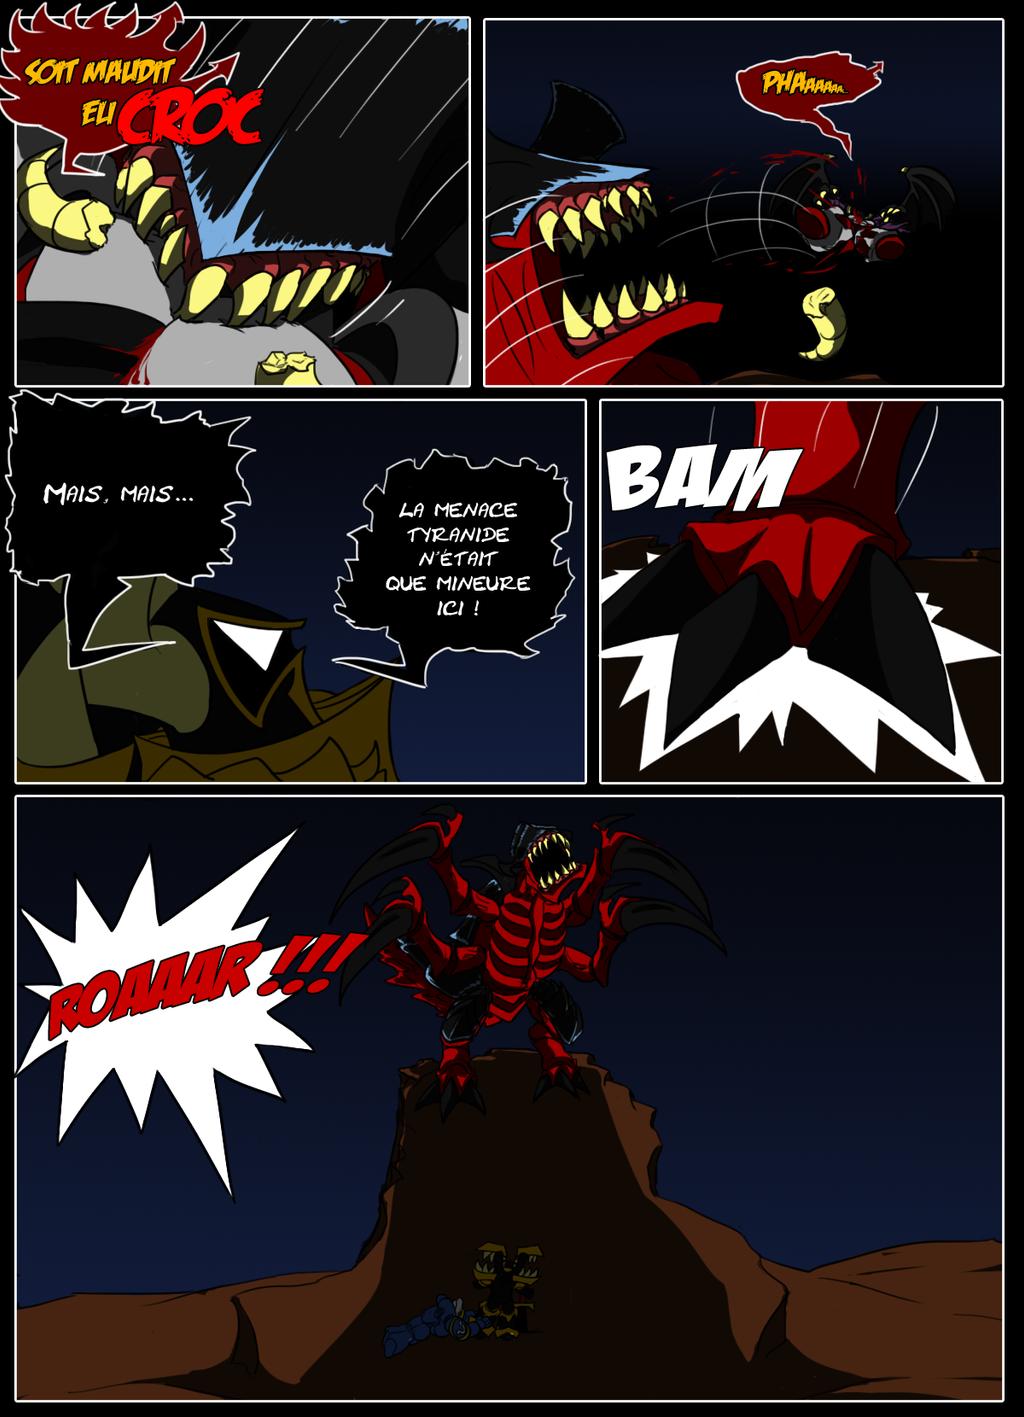 Bandes Dessinées de Warhammer 40,000 - Page 2 P46__color_by_littlecutter-d5z07mo